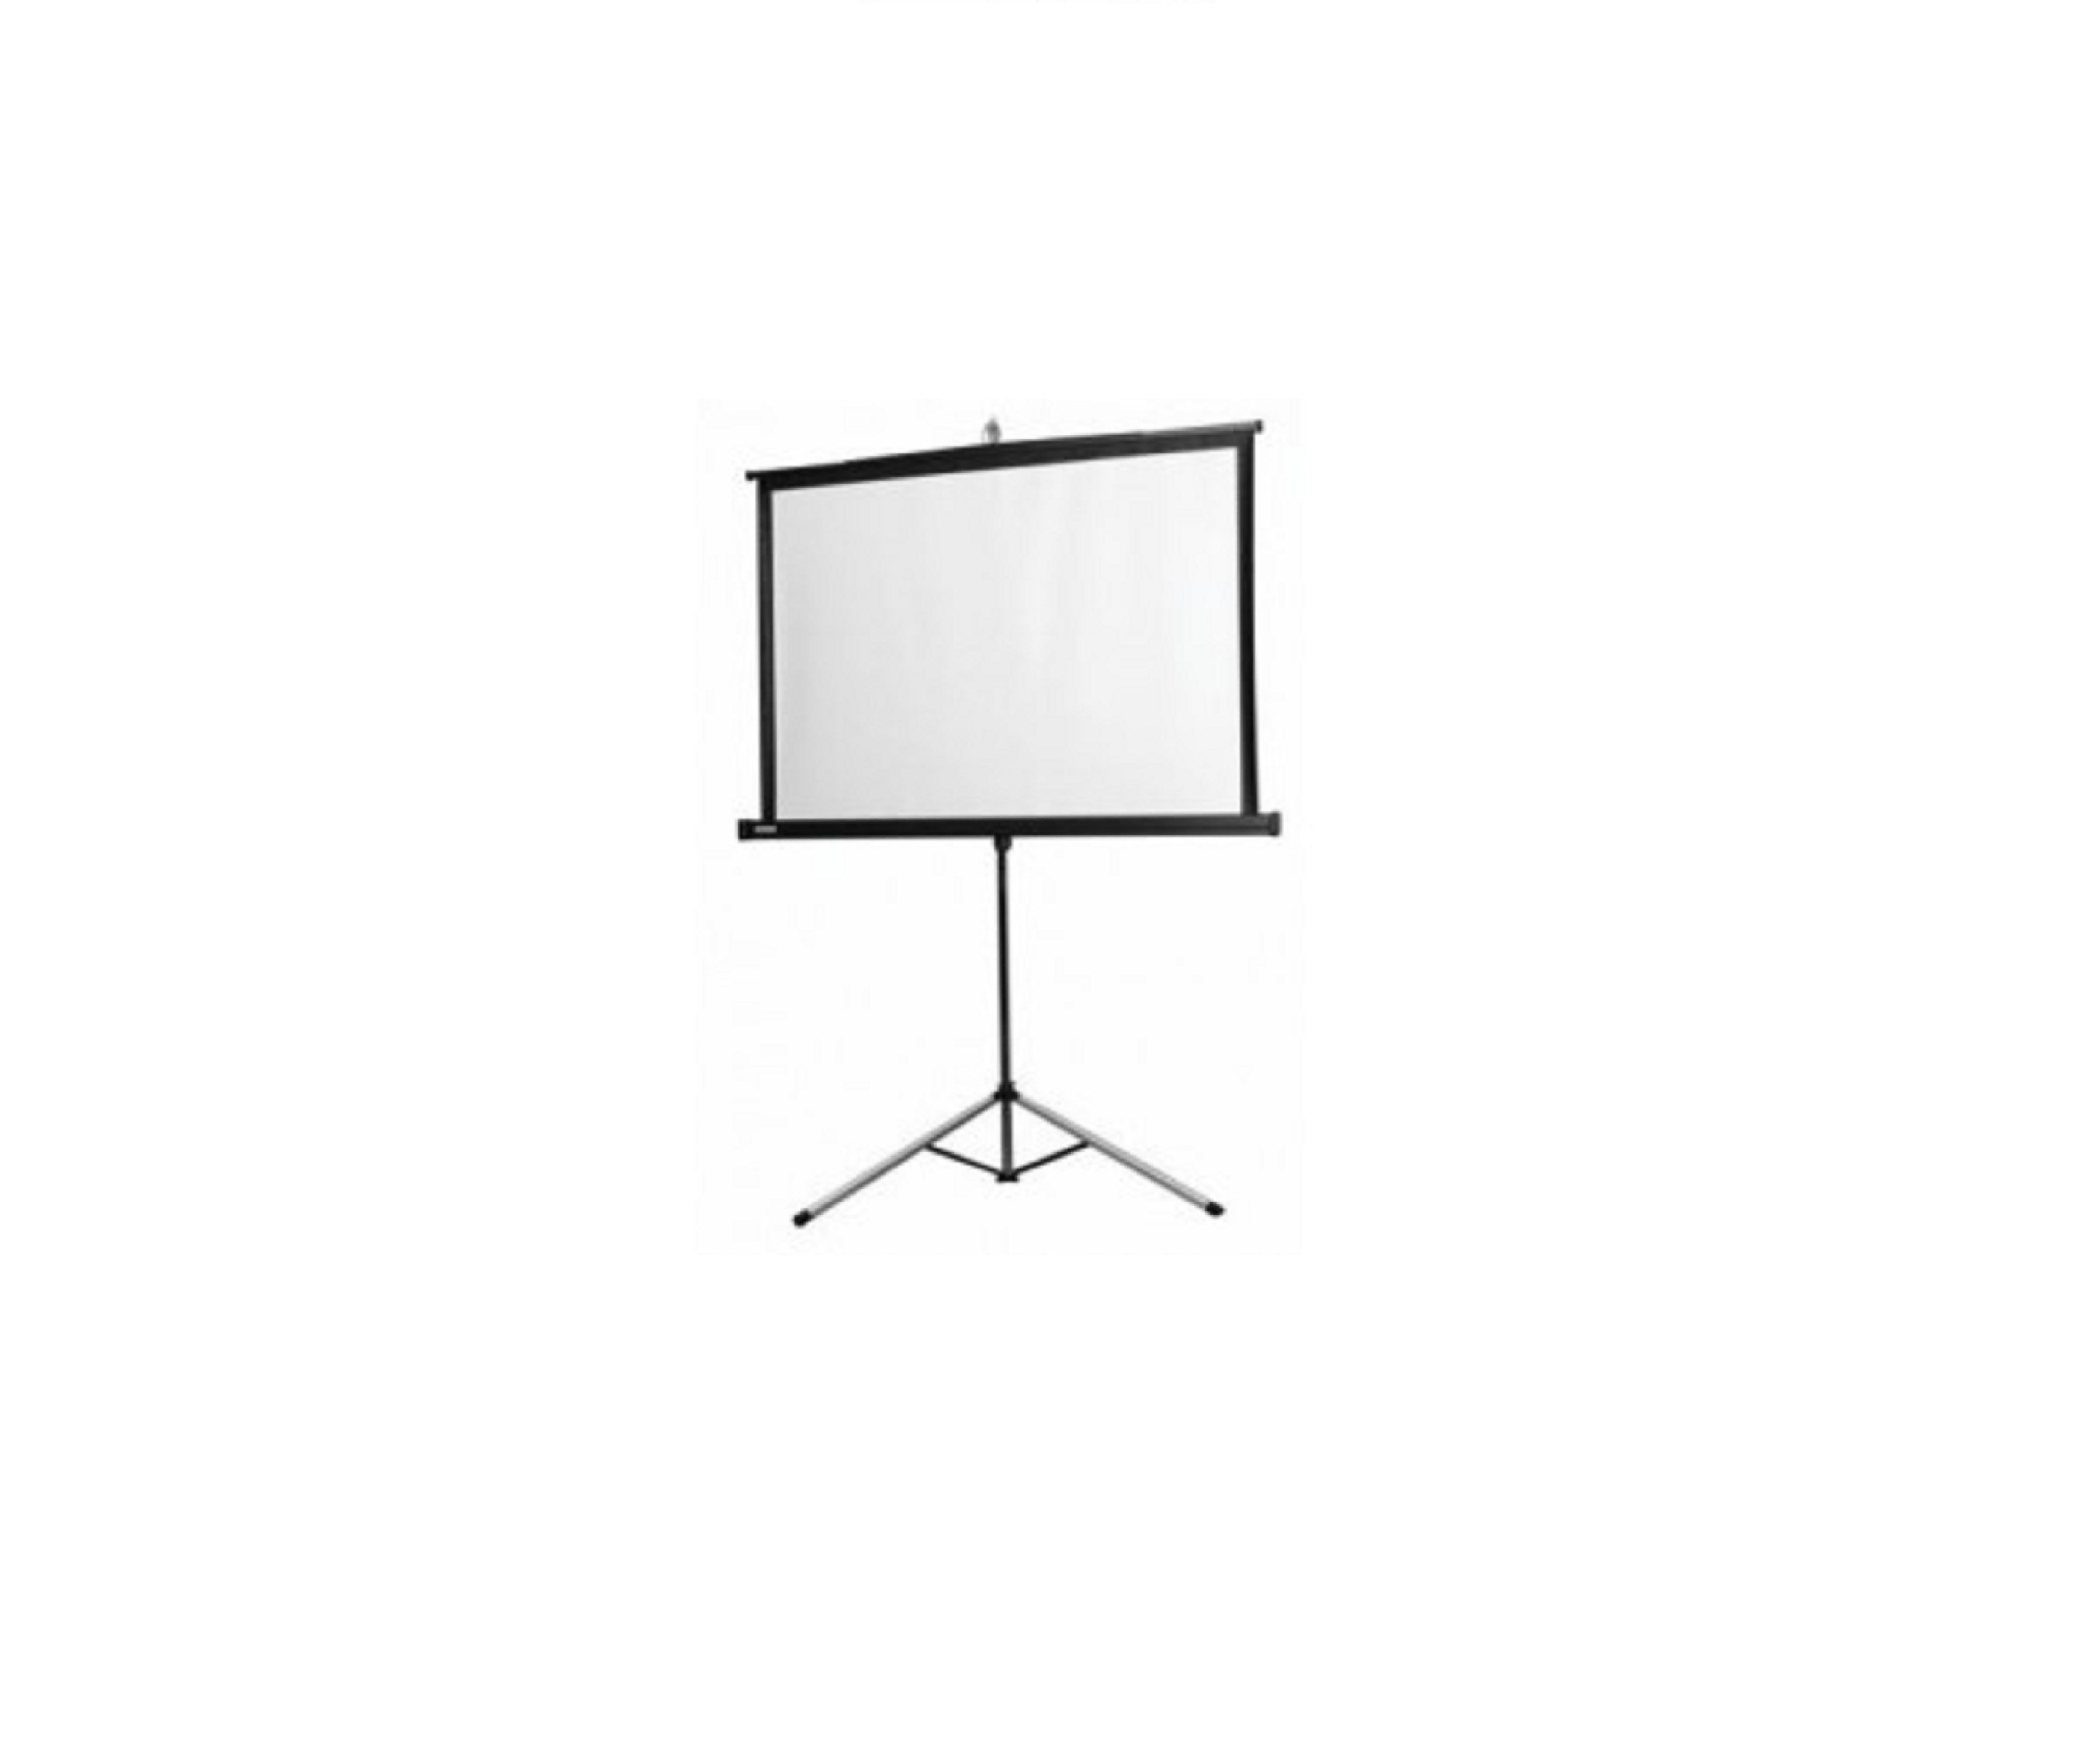 Rolscherm 1 50x1 50 Opzicht Huren